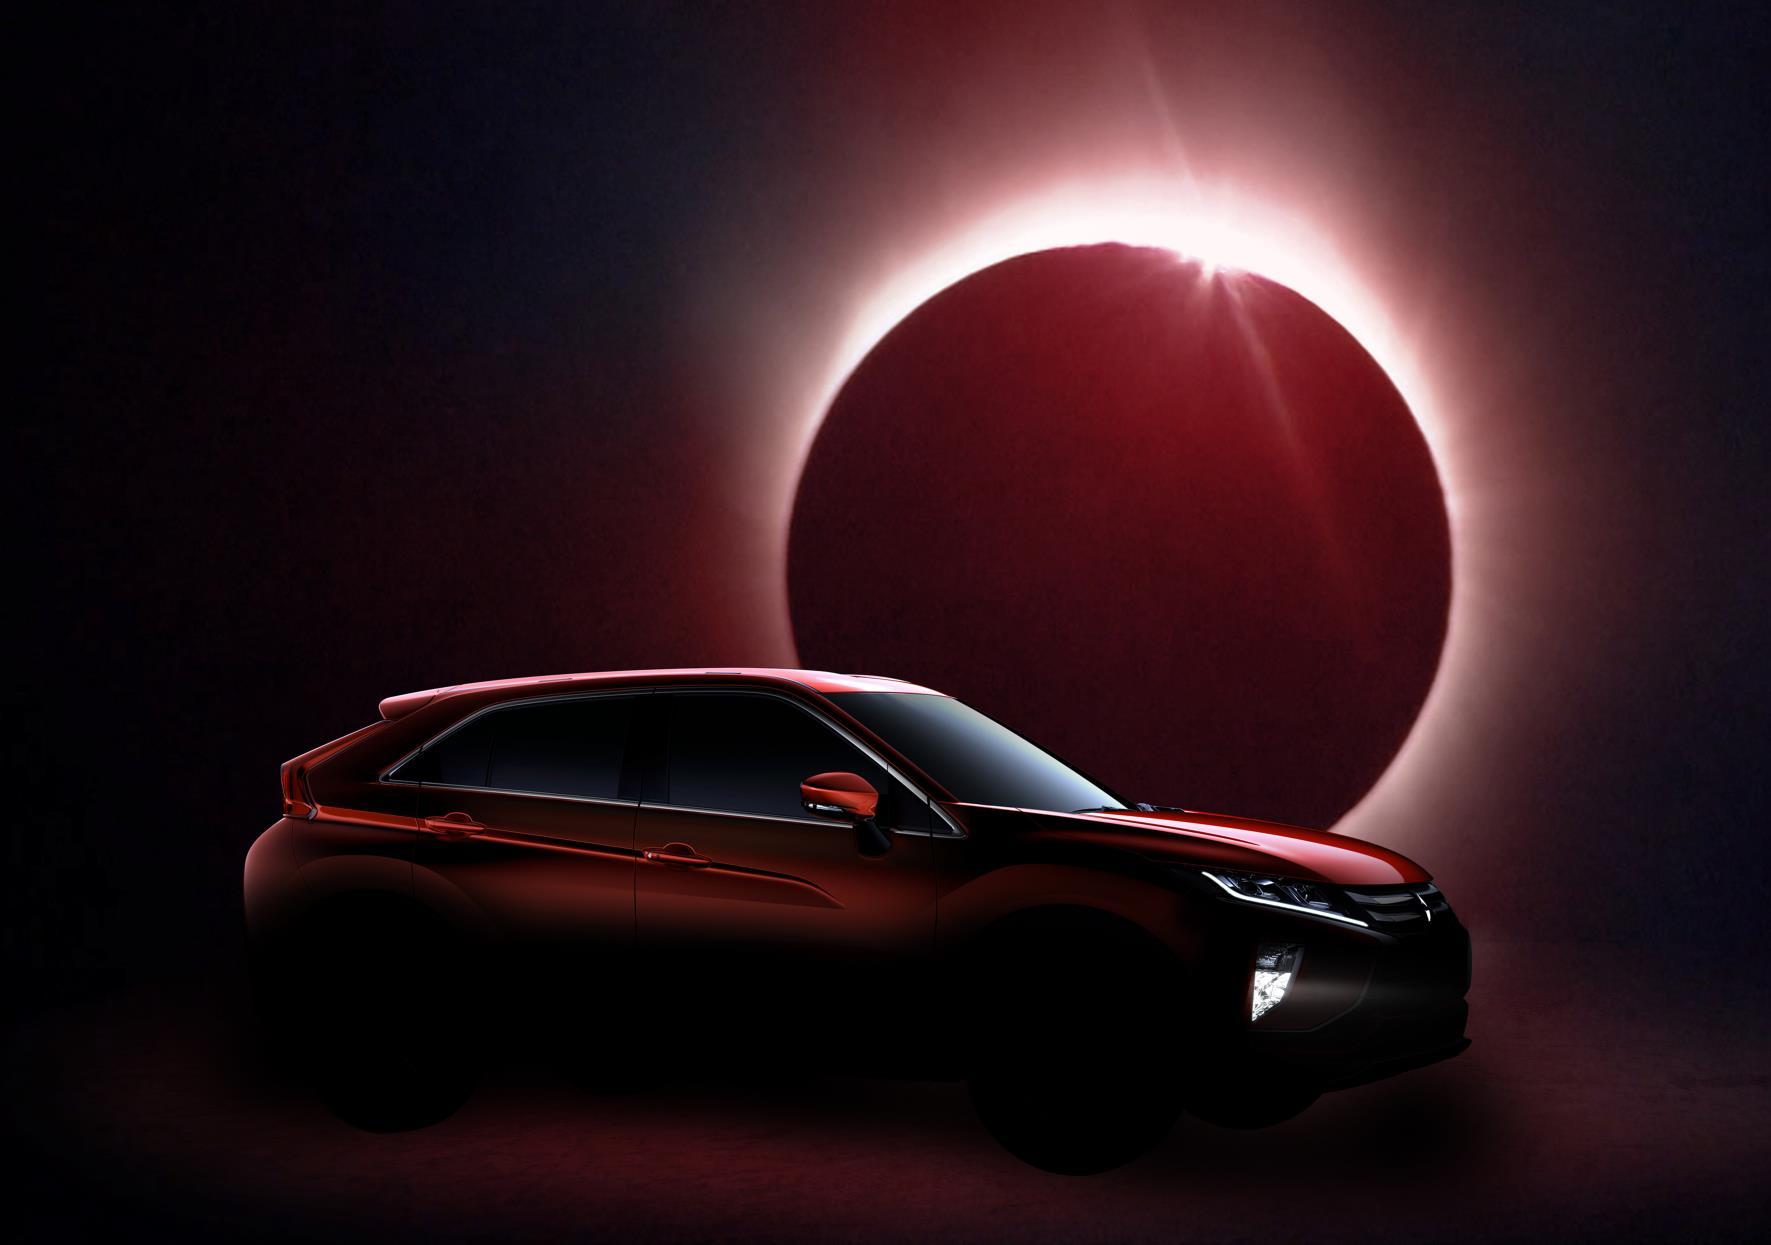 https://s1.cdn.autoevolution.com/images/news/mitsubishi-names-its-new-suv-eclipse-cross-115405_1.jpg